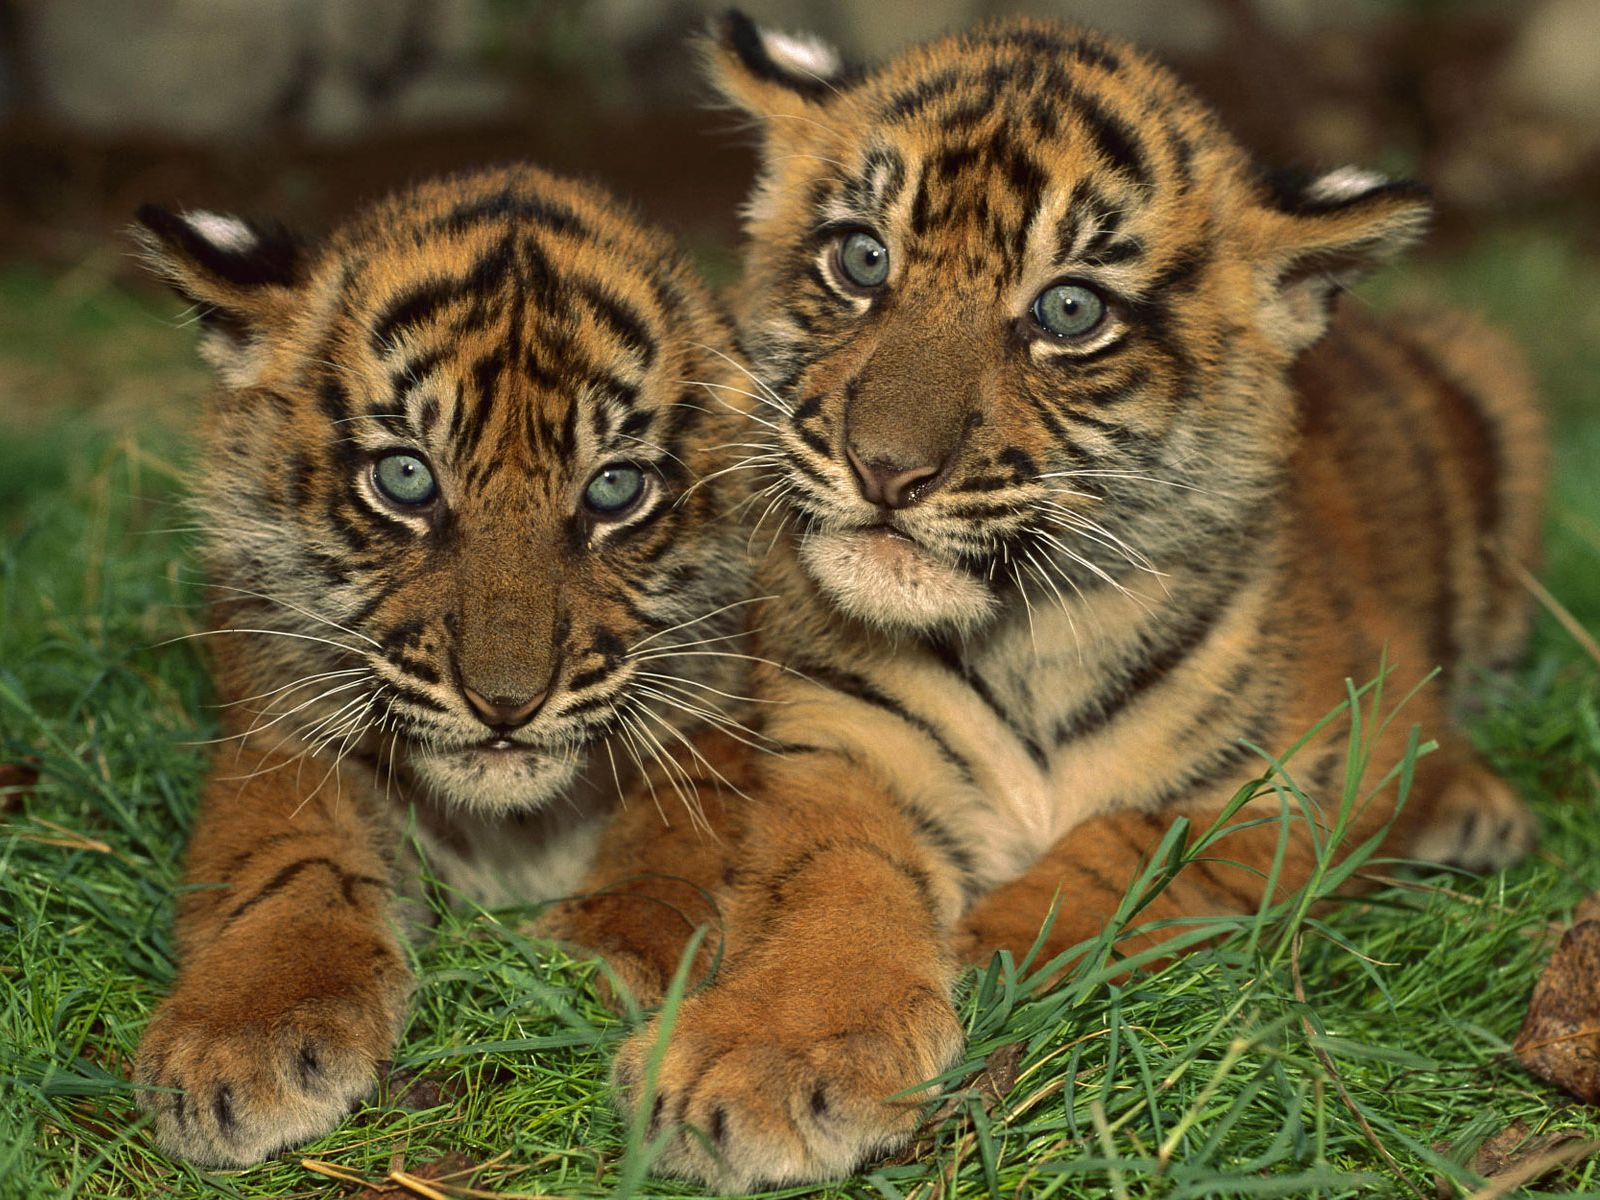 Cute Baby Animals   Cute Baby Animals Desktop Backgrounds 1600x1200